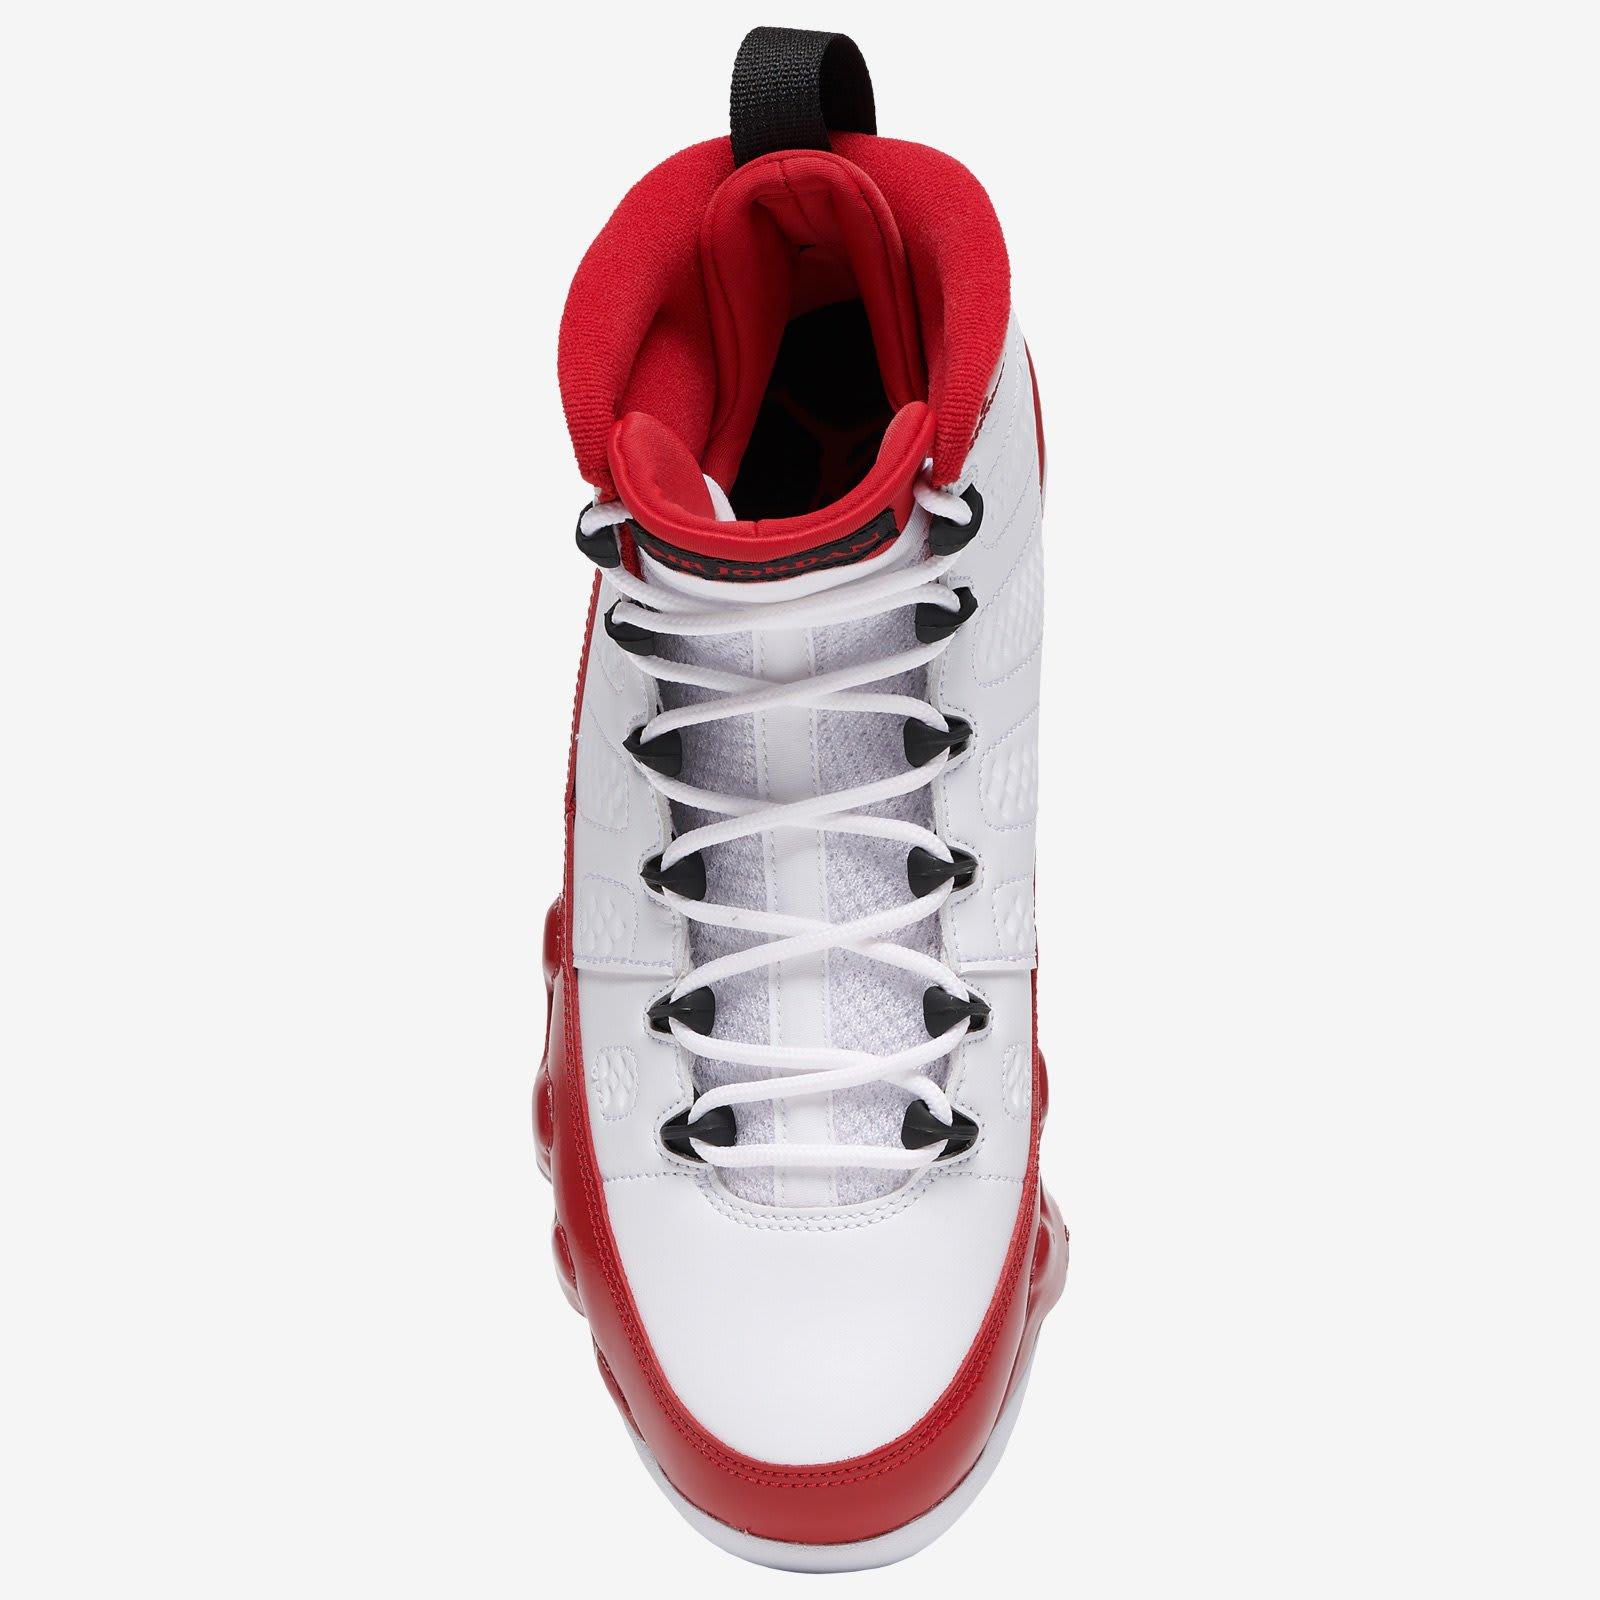 A New Bulls Colorway of the Air Jordan 9 Is Releasing Soon